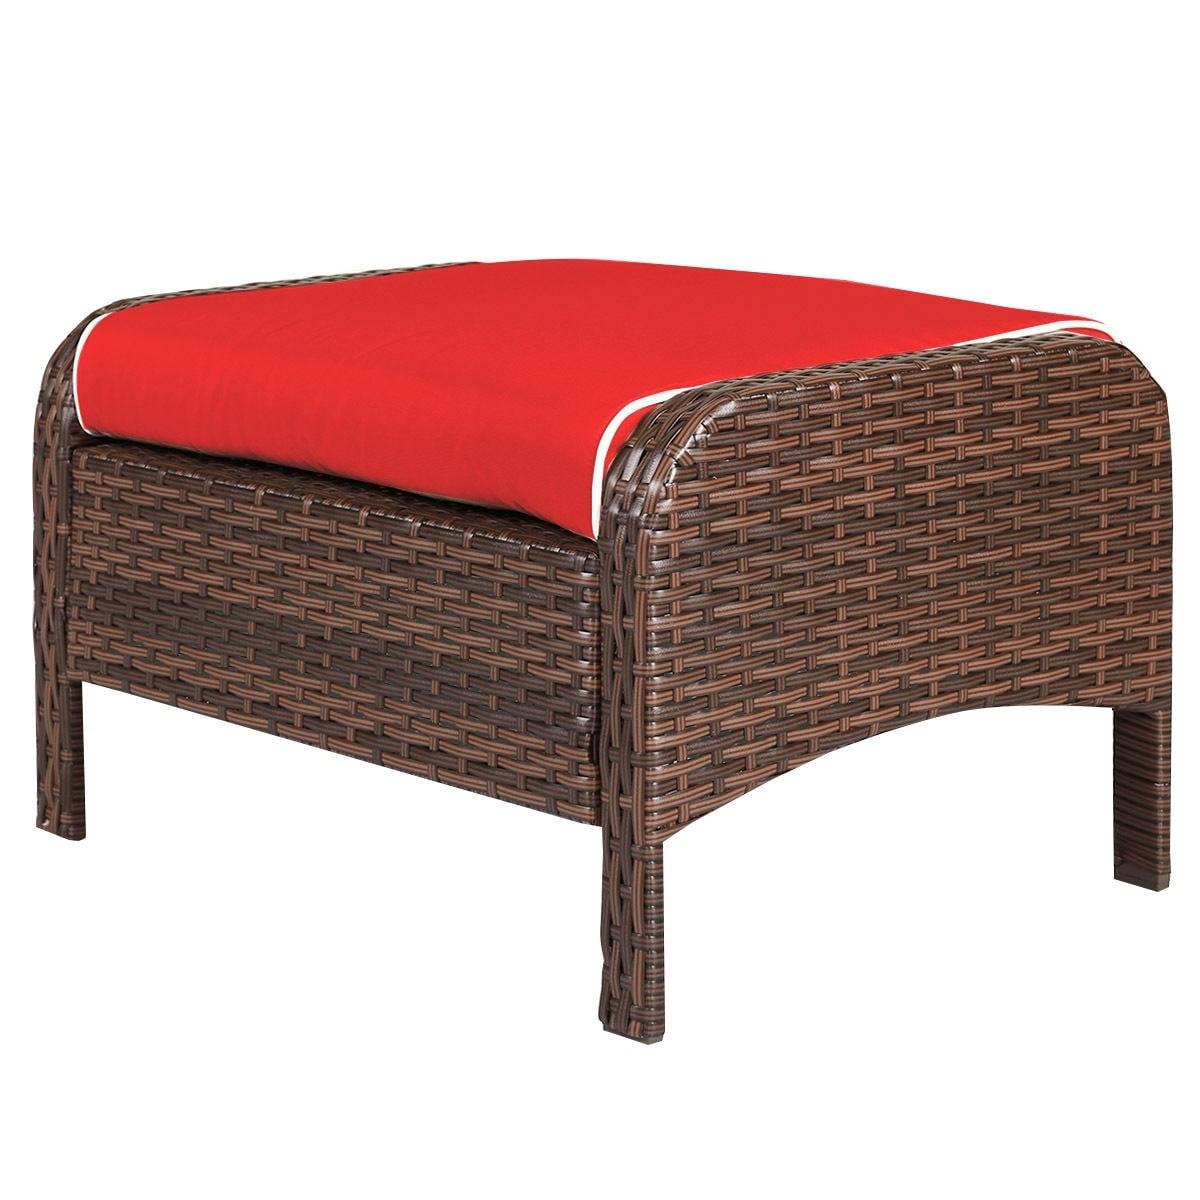 Shop Costway 5 PCS Patio Rattan Wicker Furniture Set Sofa Ottoman W/Red  Cushion Garden Yard   As Pic   Free Shipping Today   Overstock.com    16501364